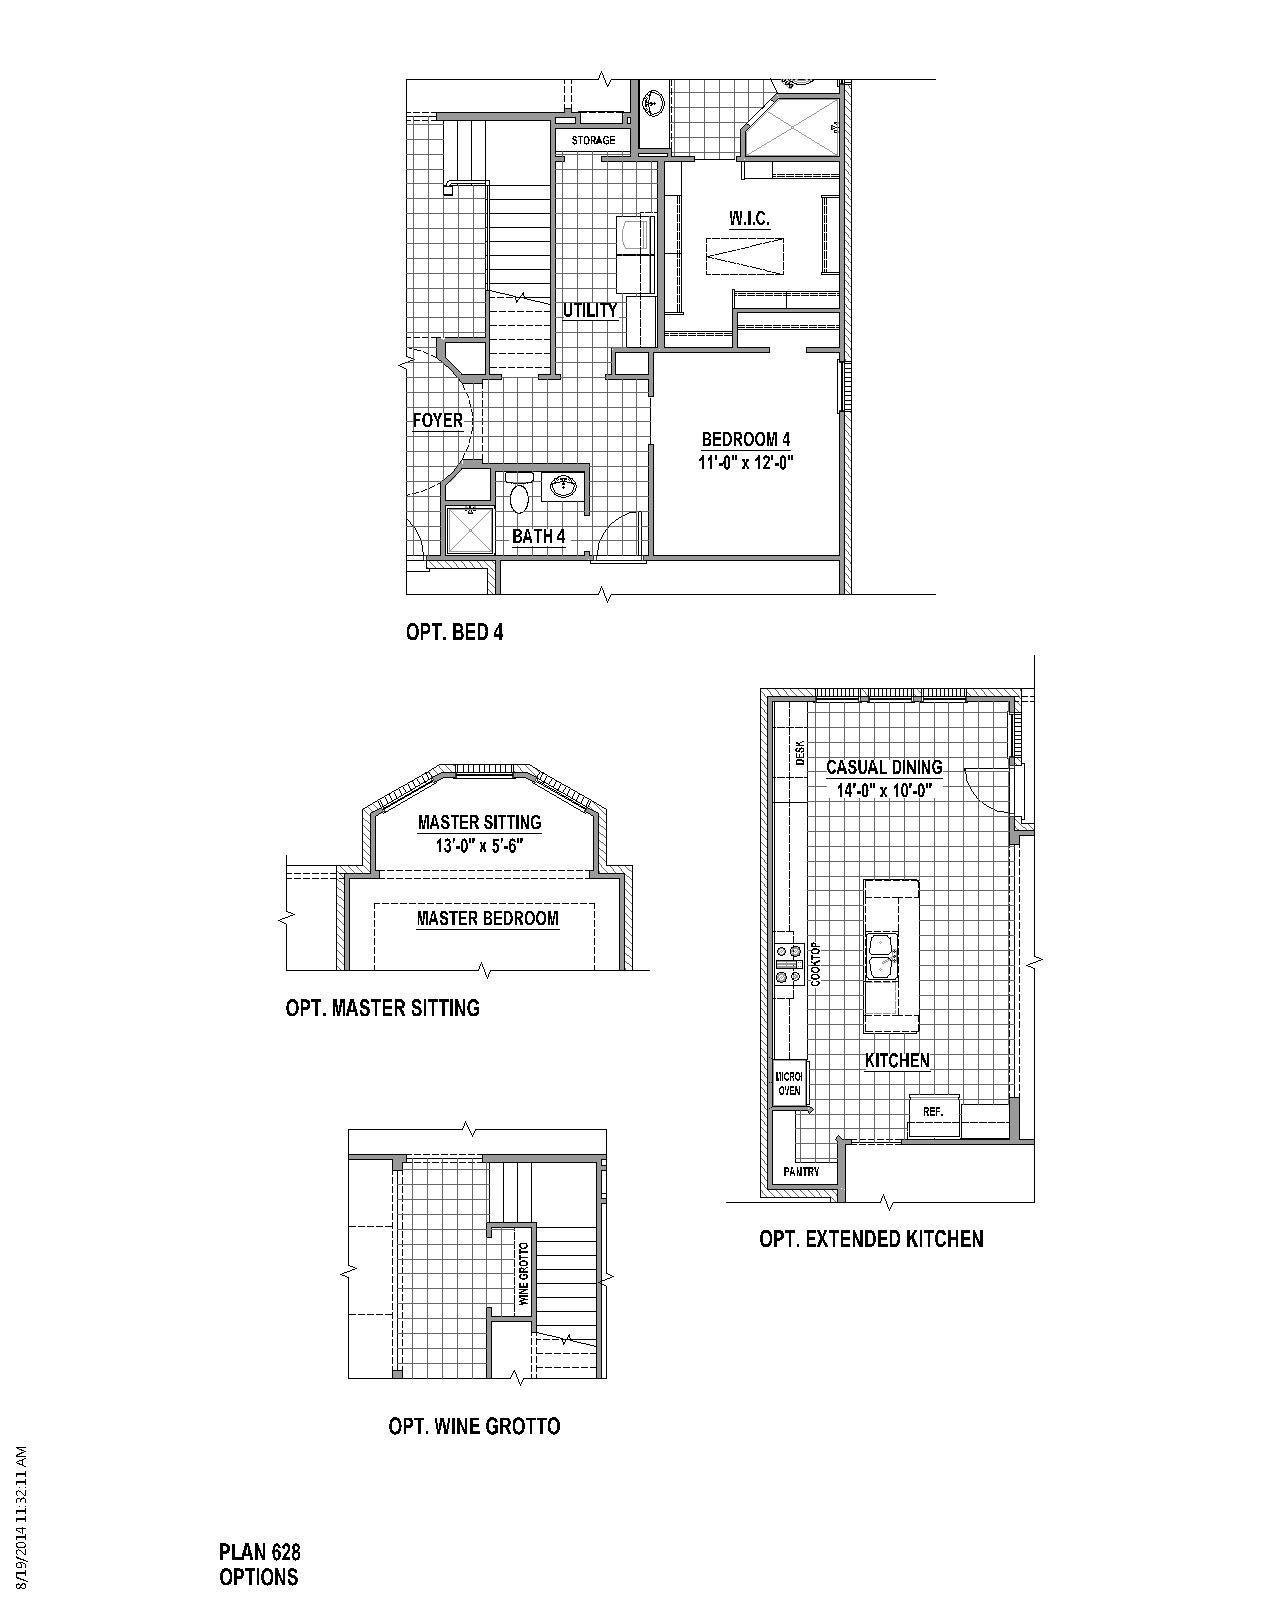 Plan 628 Floor Plan